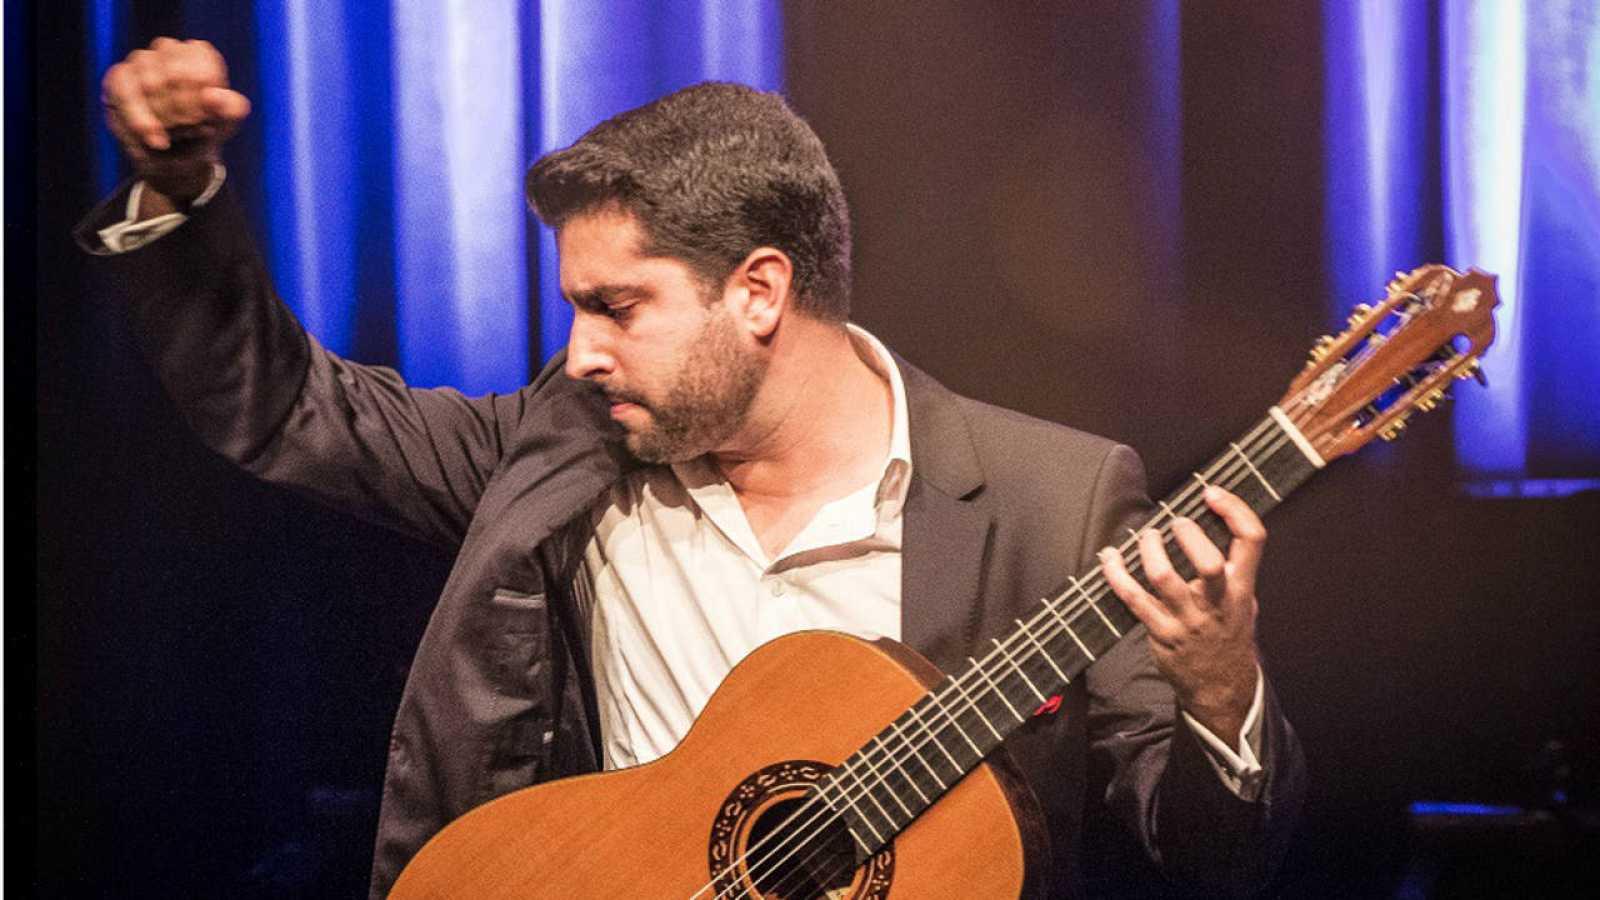 El guitarrista malaguello Rafael Aguirre